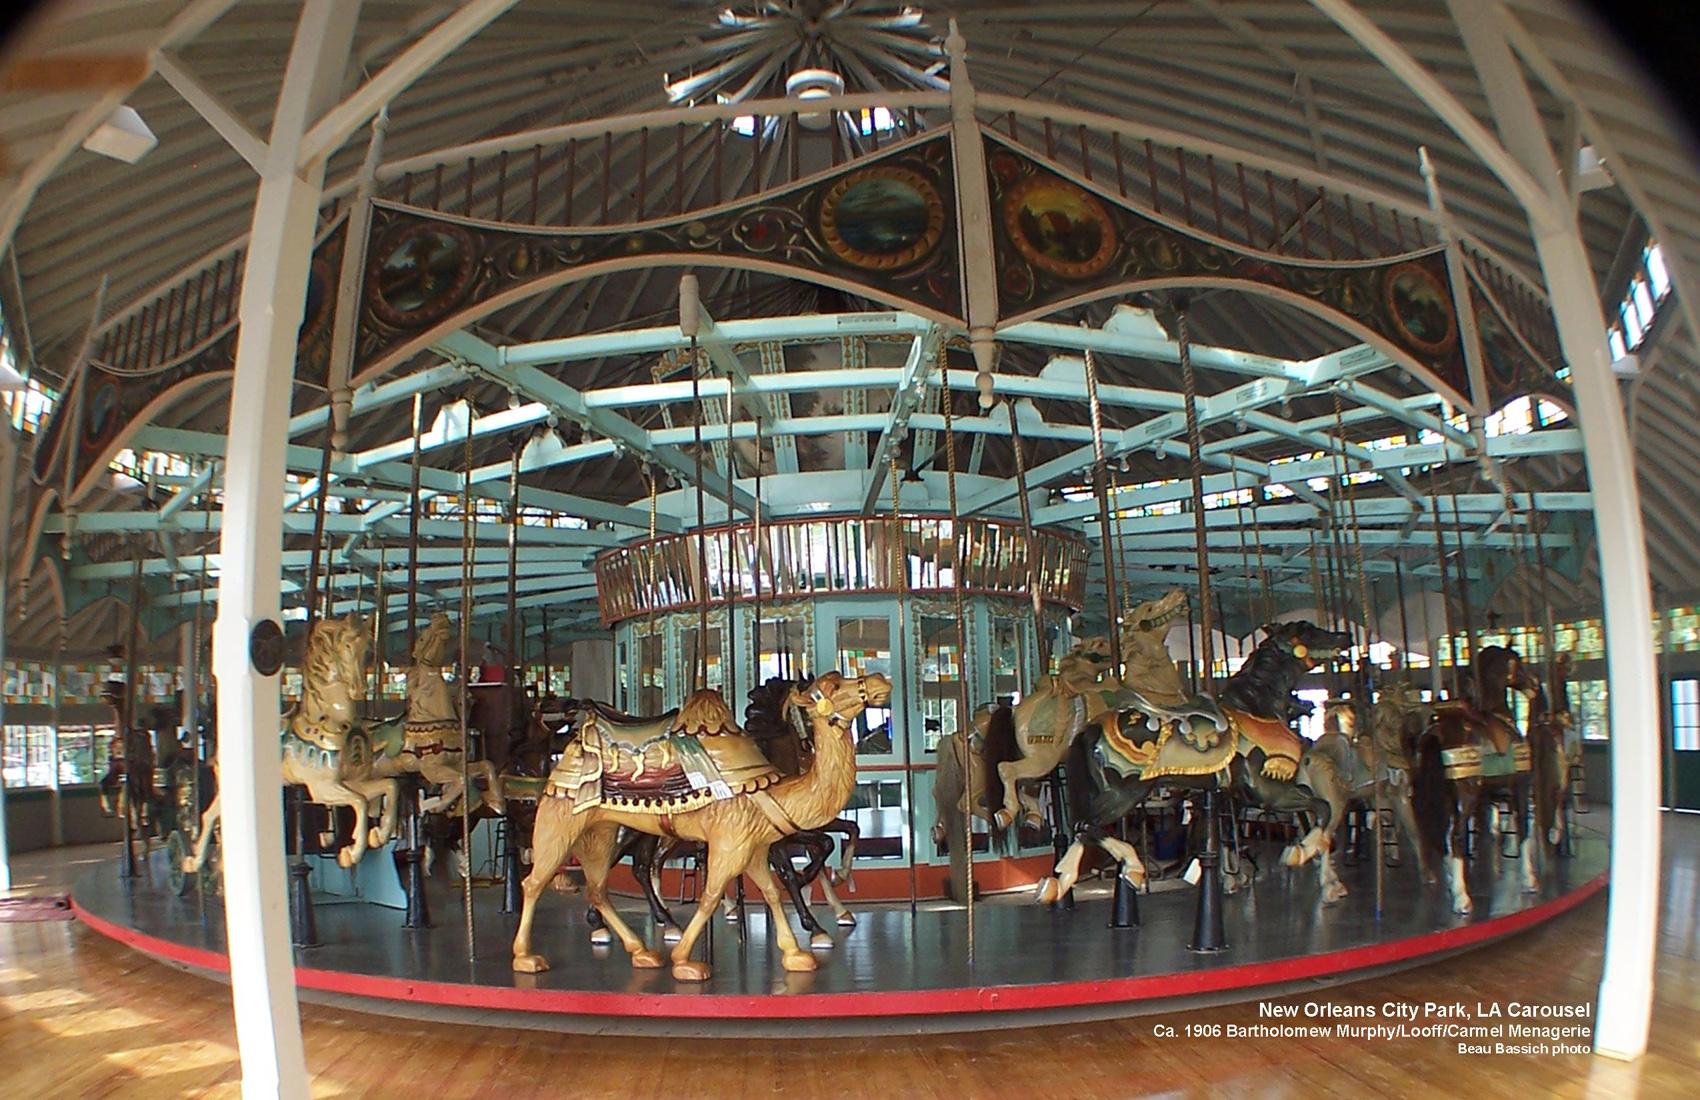 1906-New-Orleans-City-Park-carousel-CNT-center-Oct-06